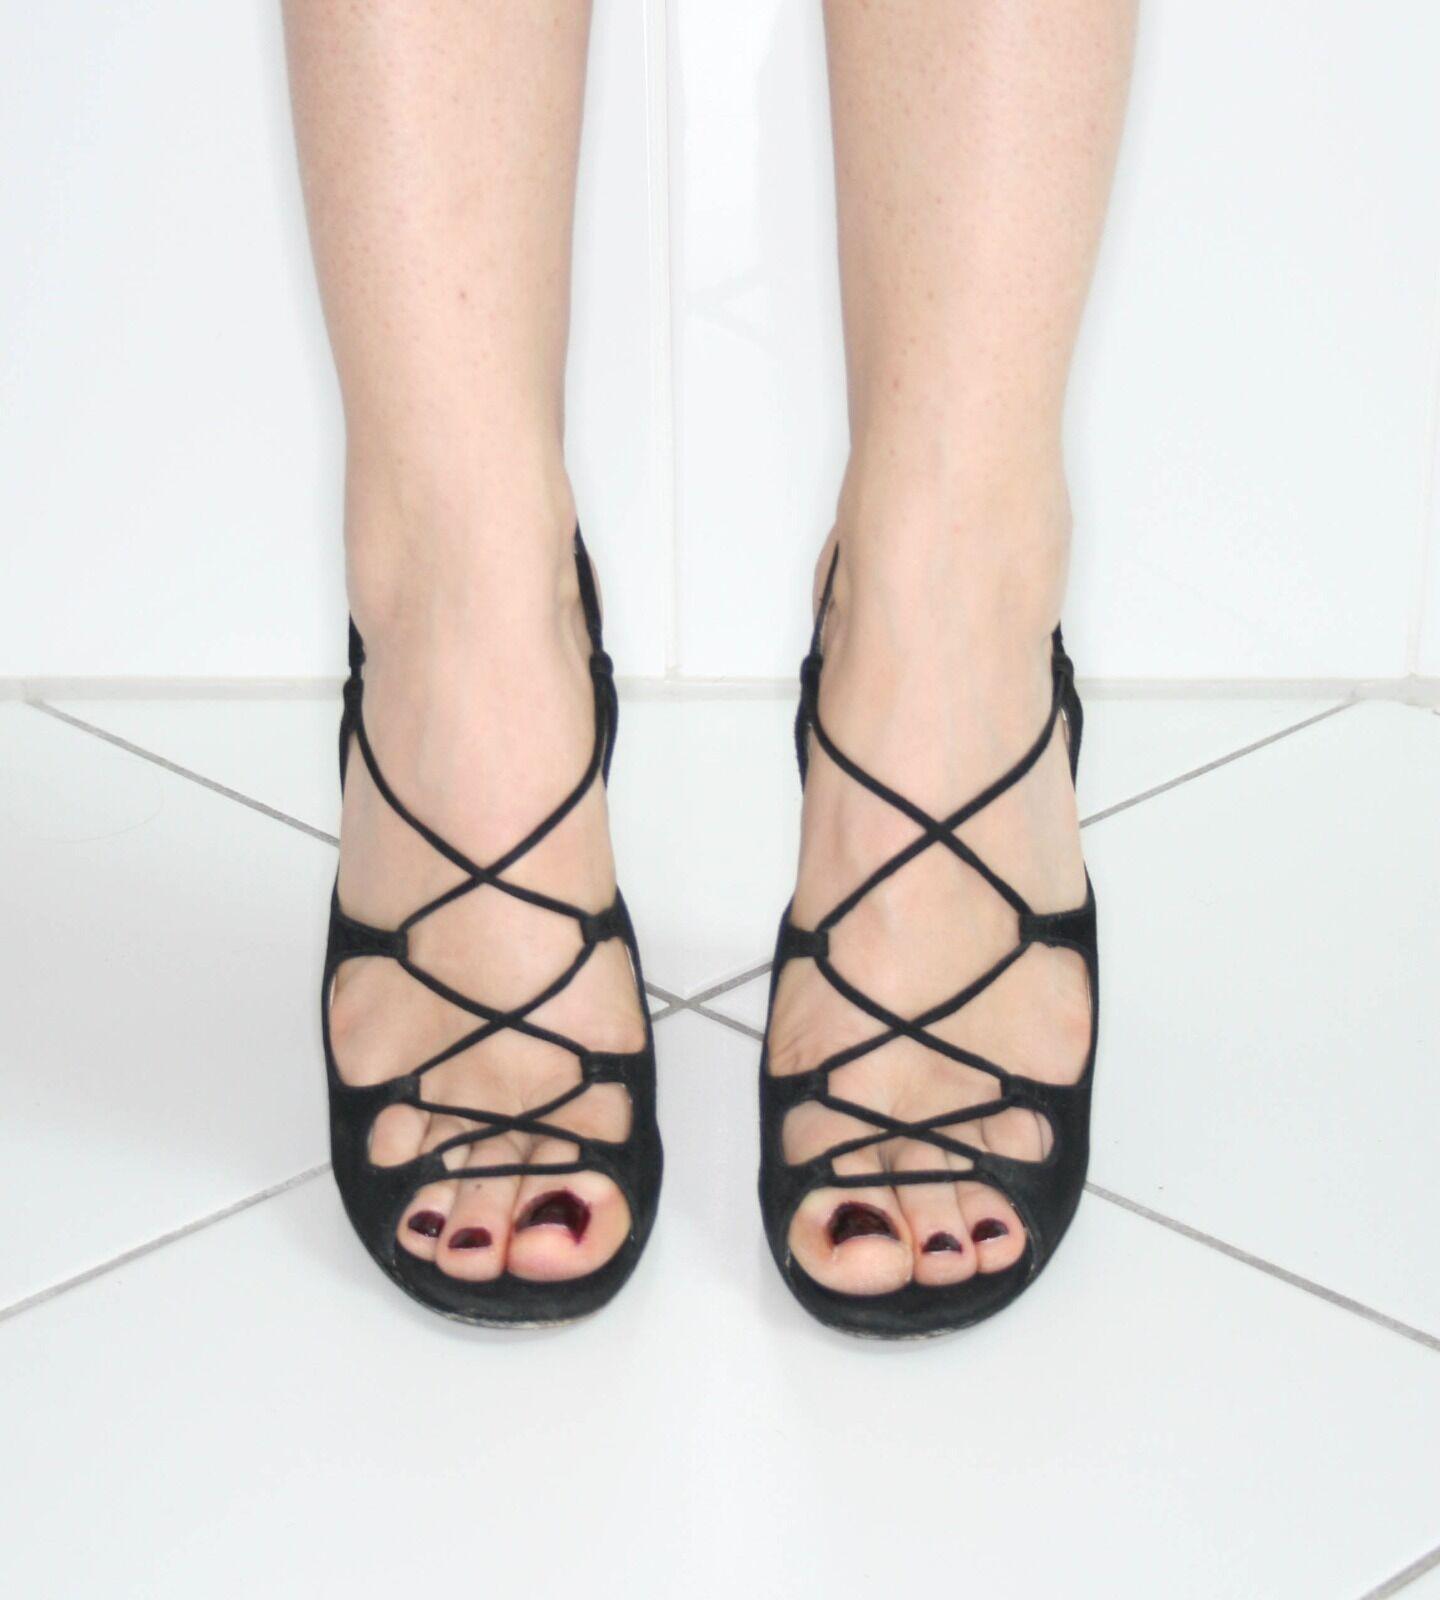 prada high heel suede lace up uk sz. 40 shoe stunning uk up 6.5 156942